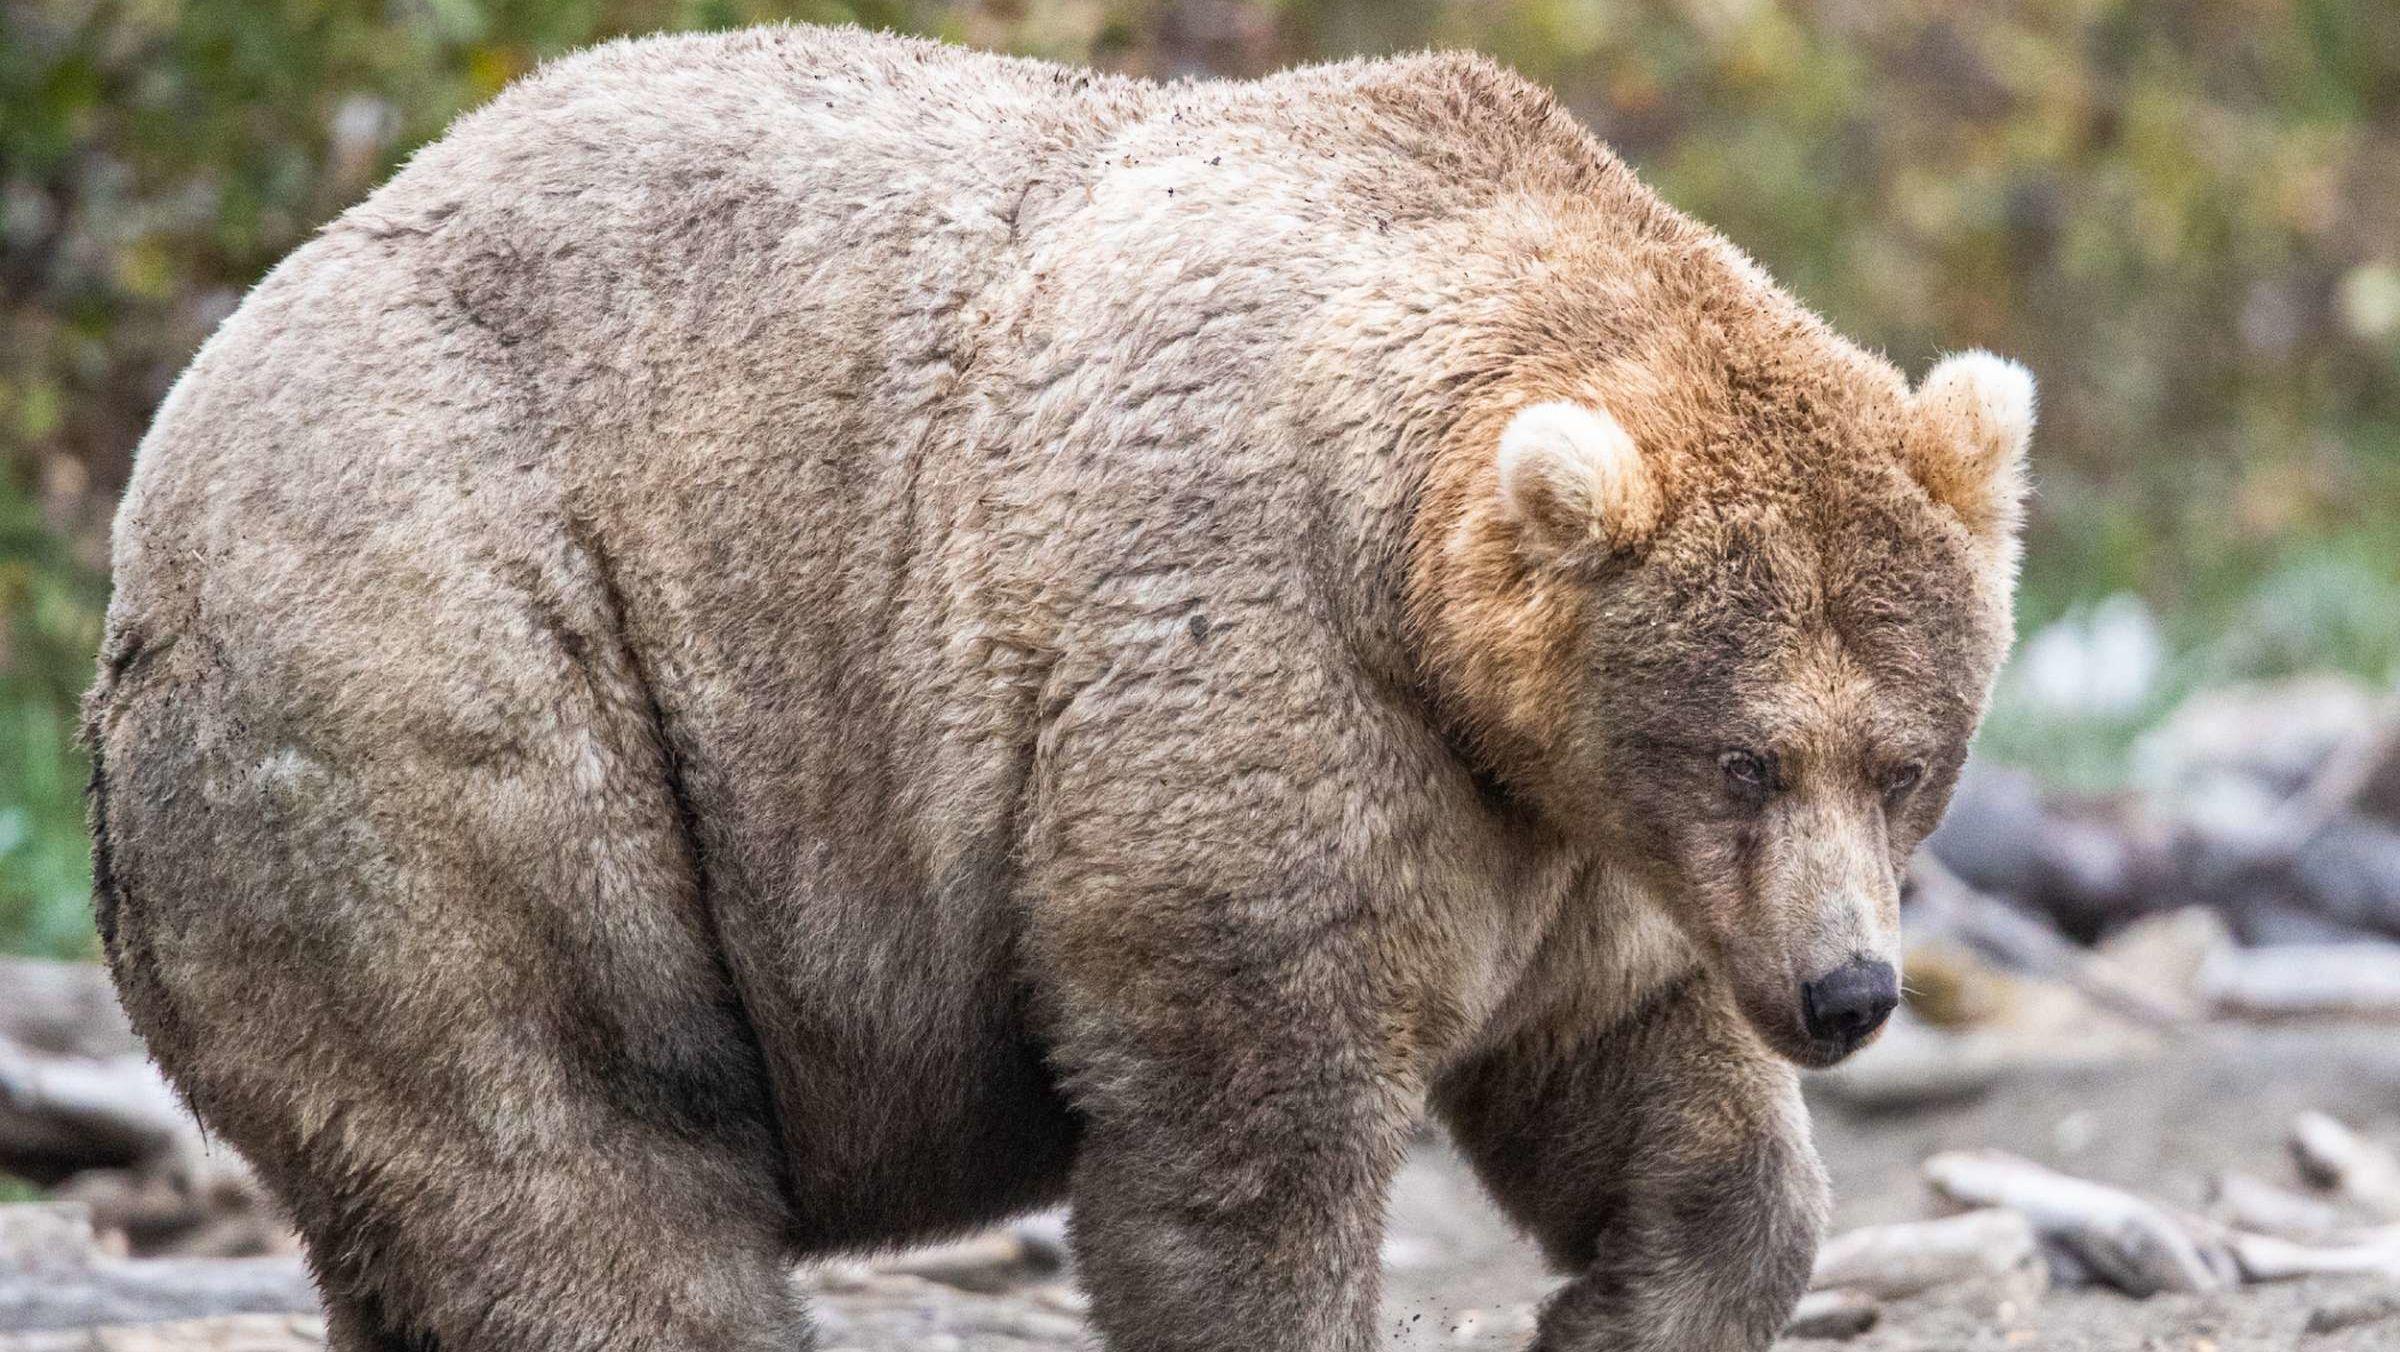 Meet Holly: The Winner of Alaska's 'Fat Bear Week' Competition at Katmai National Park